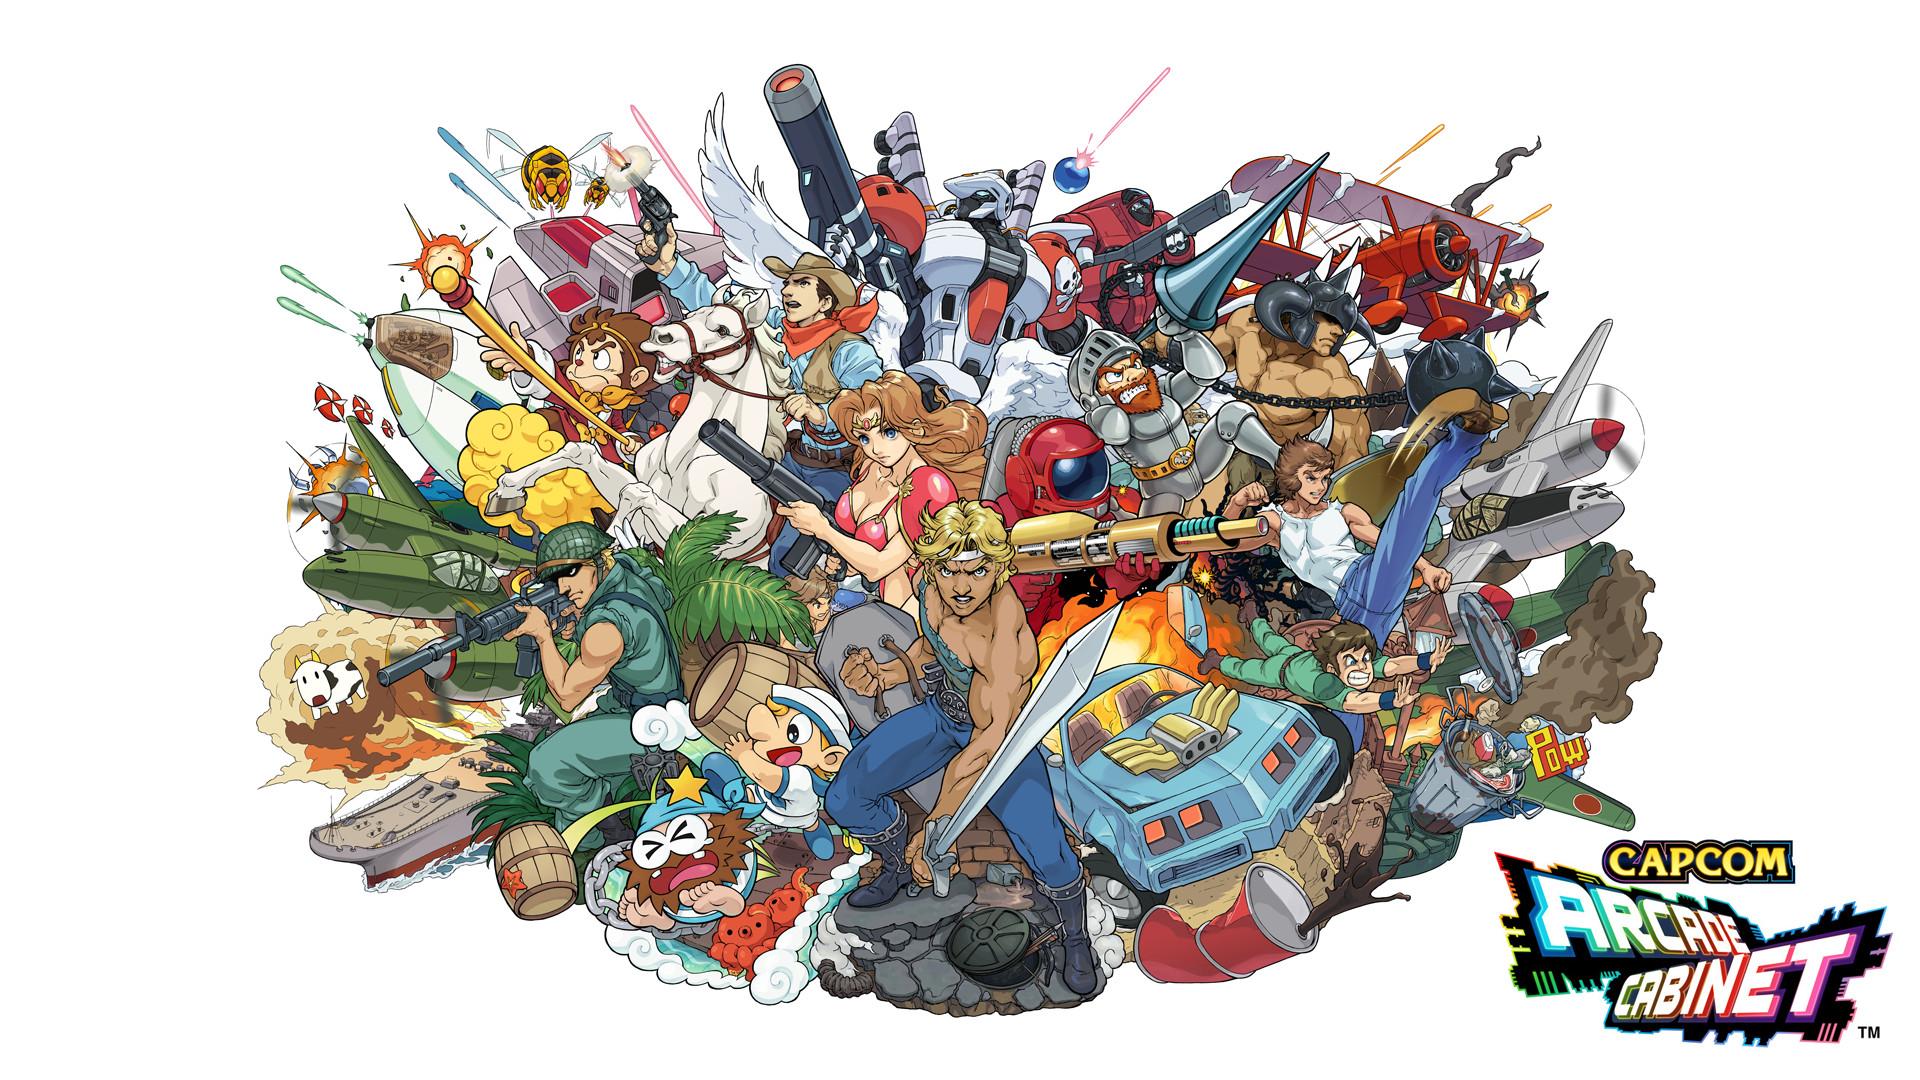 … Capcom Arcade Cabinet wallpaper edit by Bonsewswesa